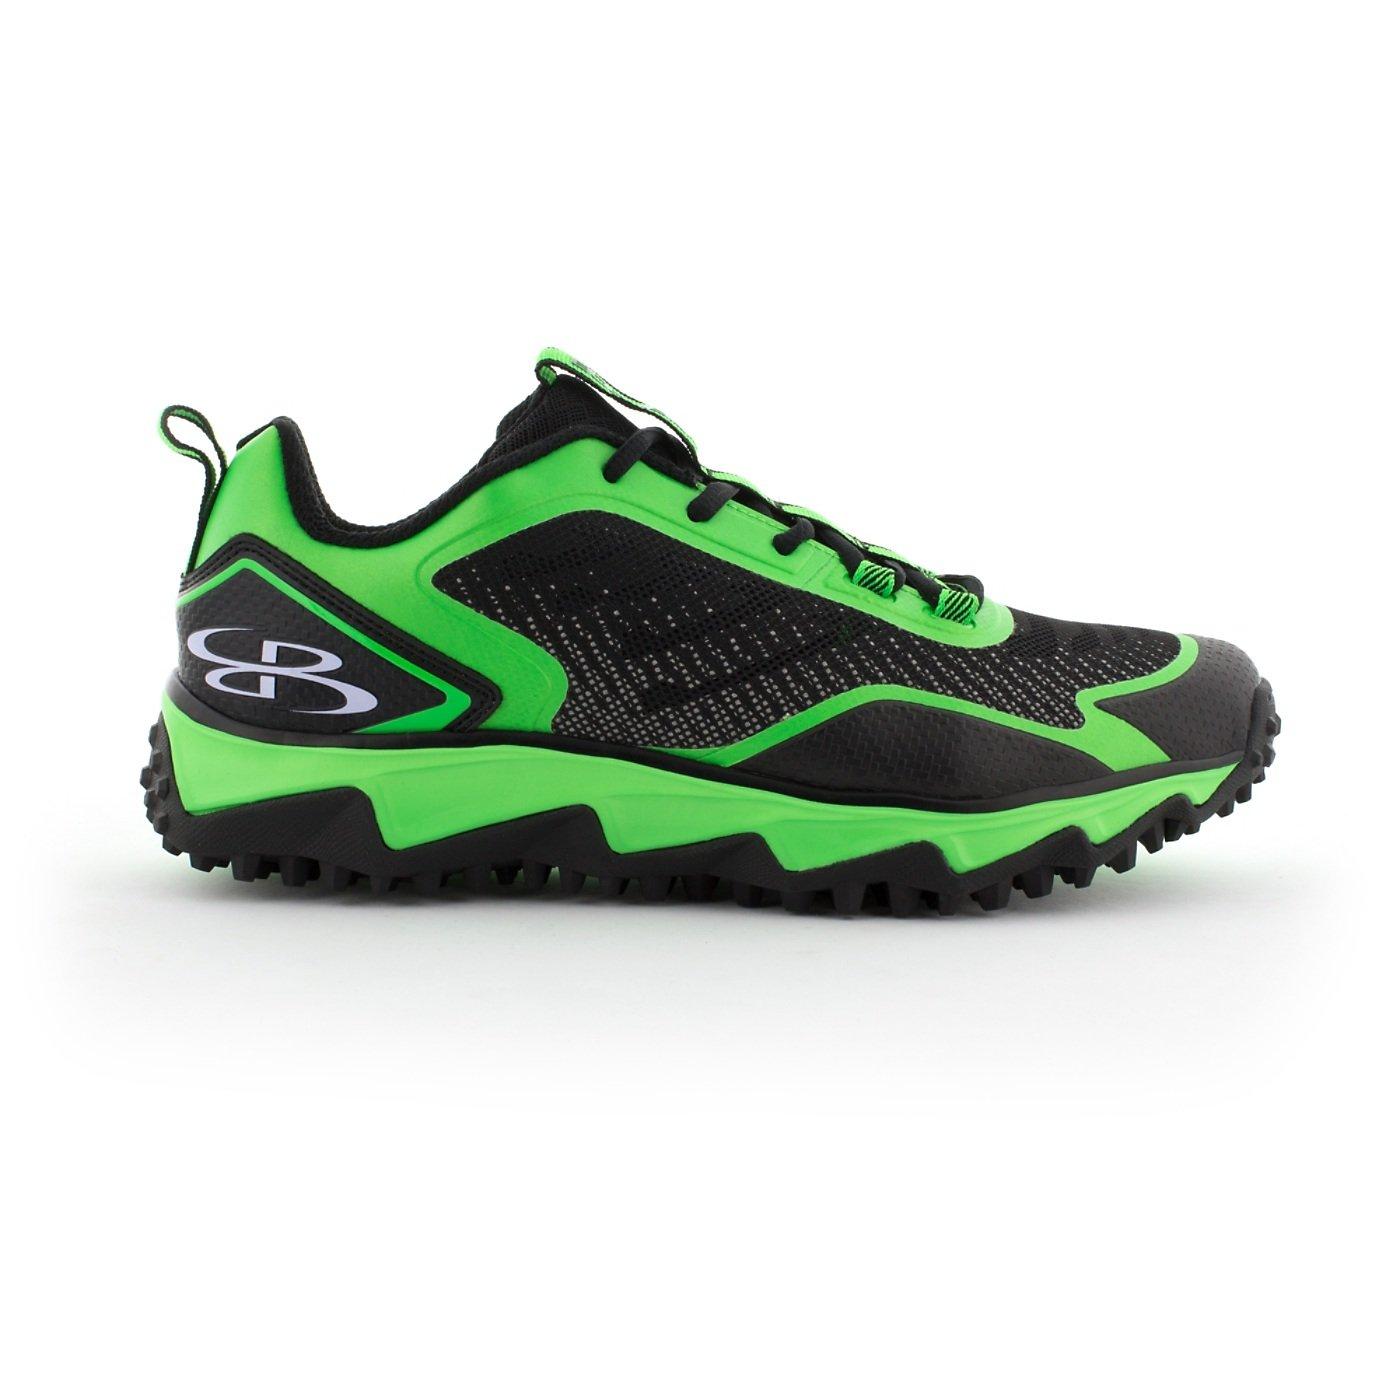 BoombahメンズBerzerk Turf Shoes – 13色オプション – 複数のサイズ B076B27QY9 11|ブラック/ライムグリーン ブラック/ライムグリーン 11